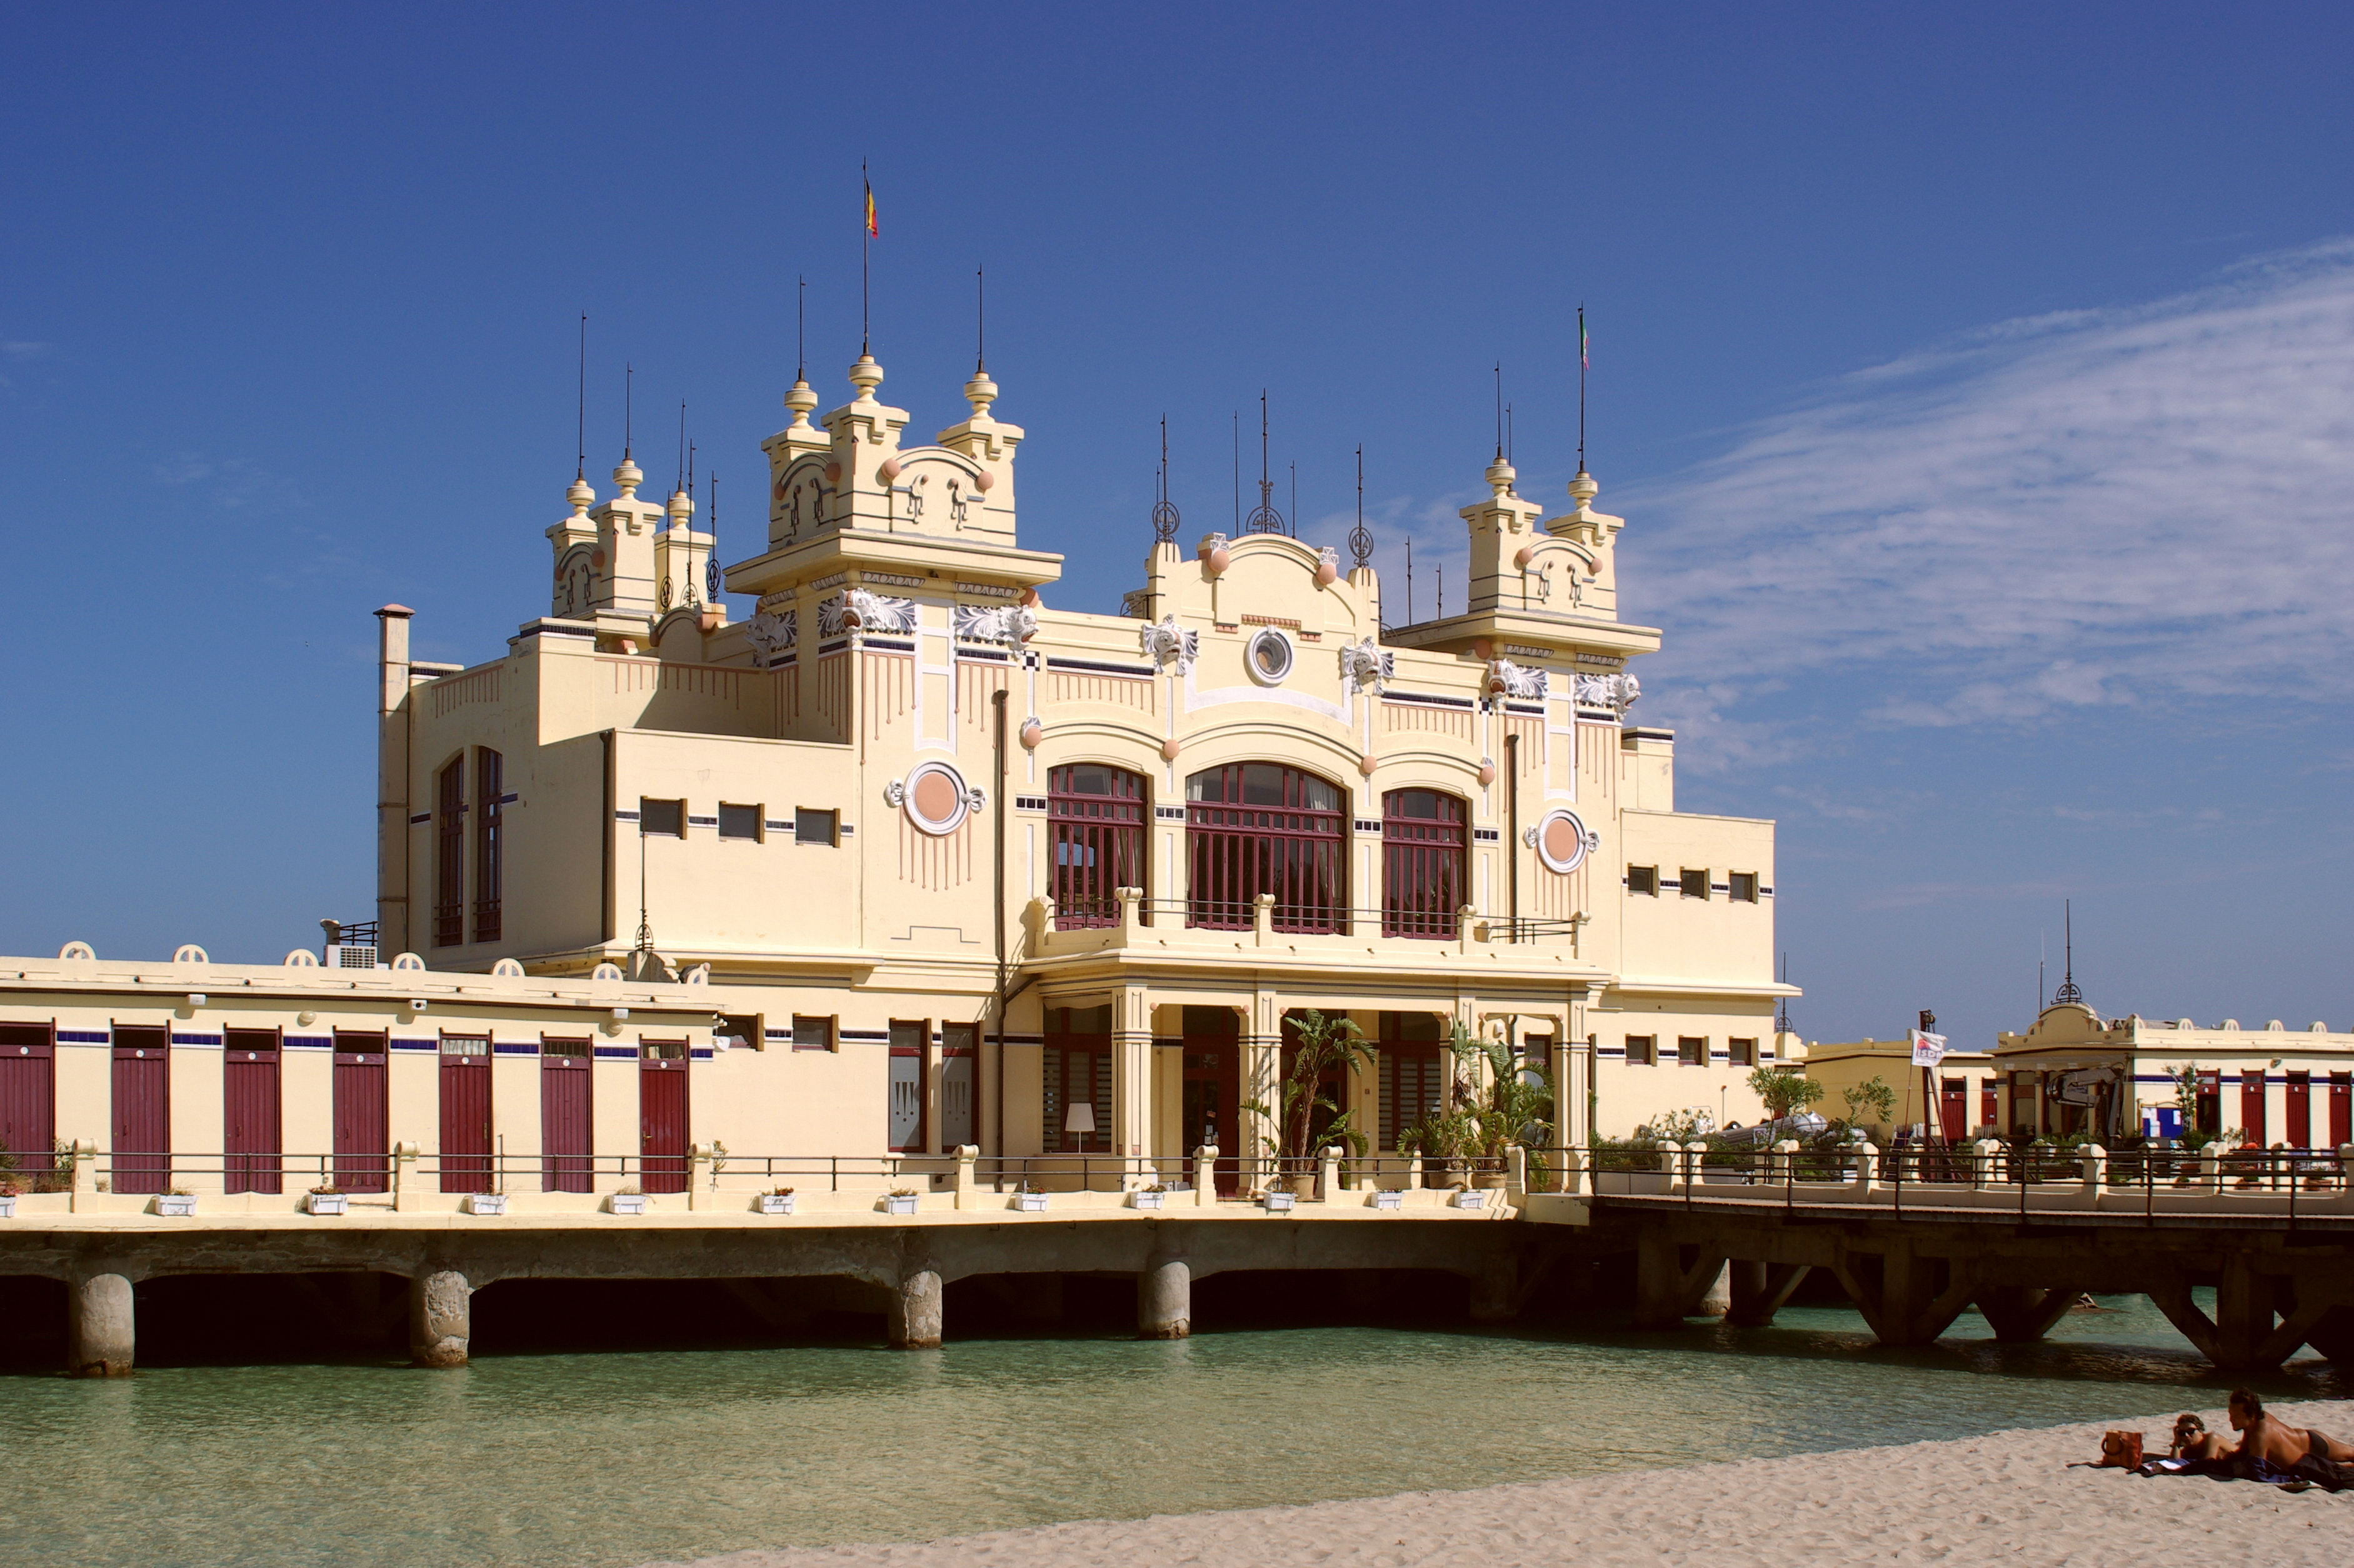 File:Mondello BW 2012-10-09 14-16-55.JPG - Wikimedia Commons